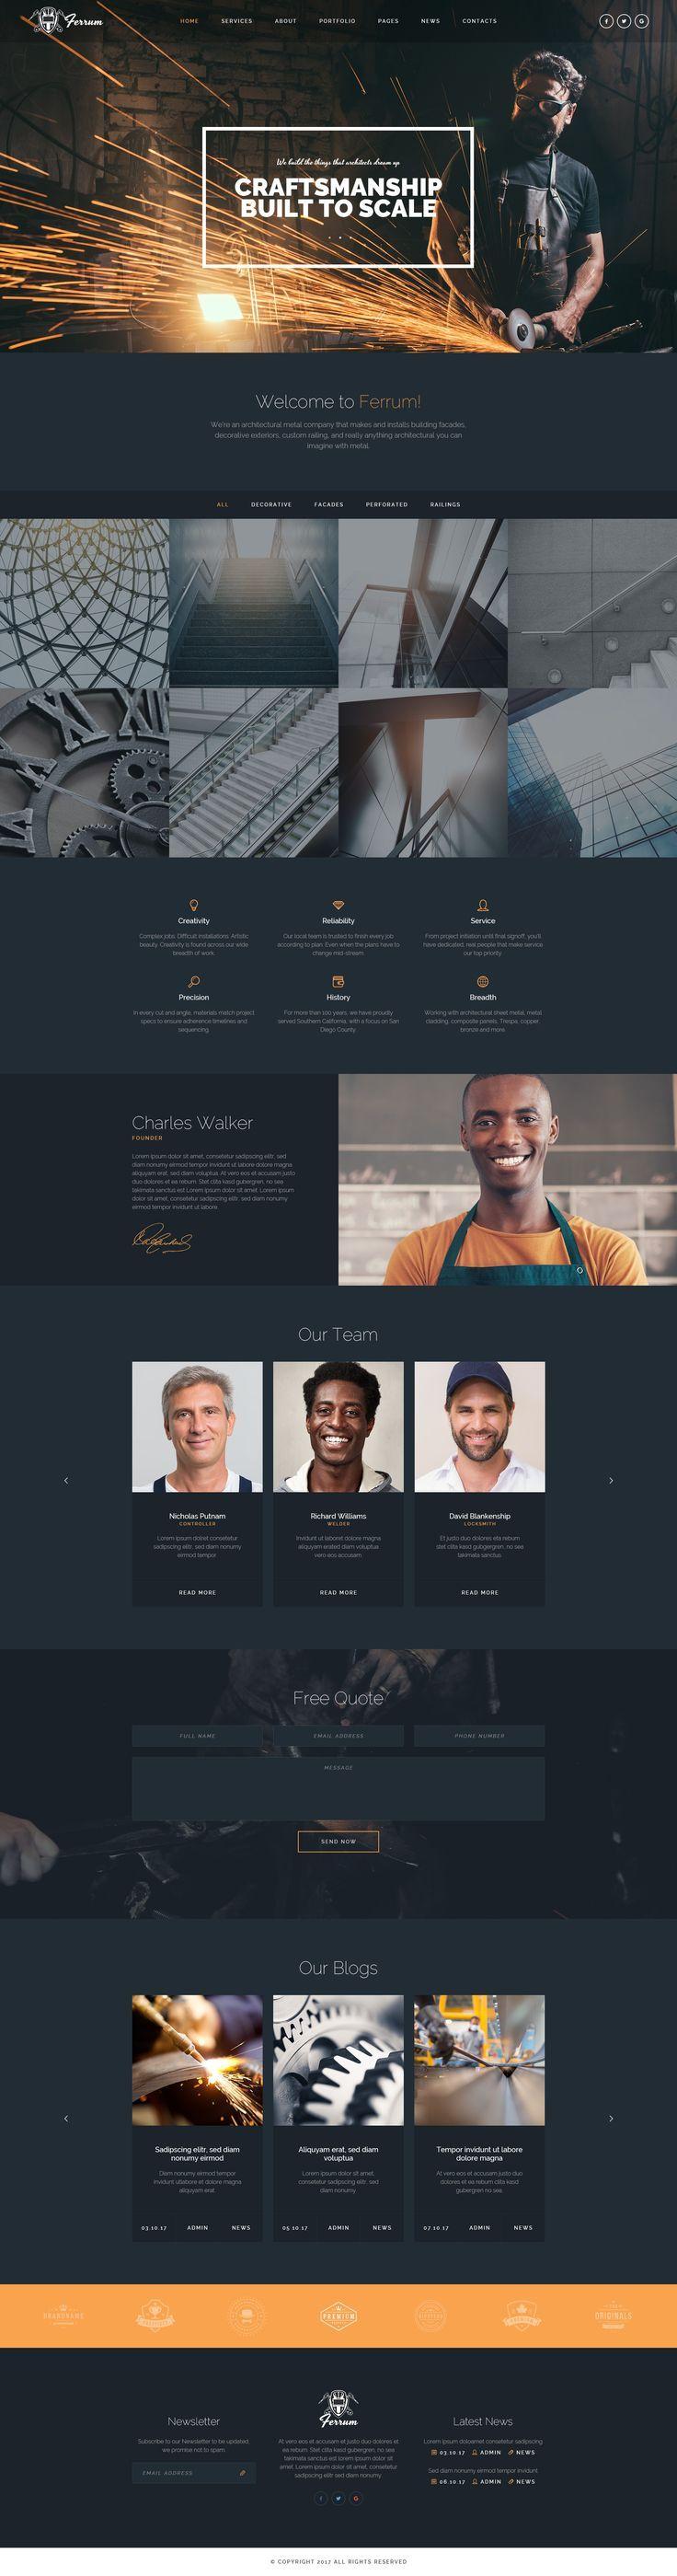 51 best ui ux designs images on pinterest psd templates mobile